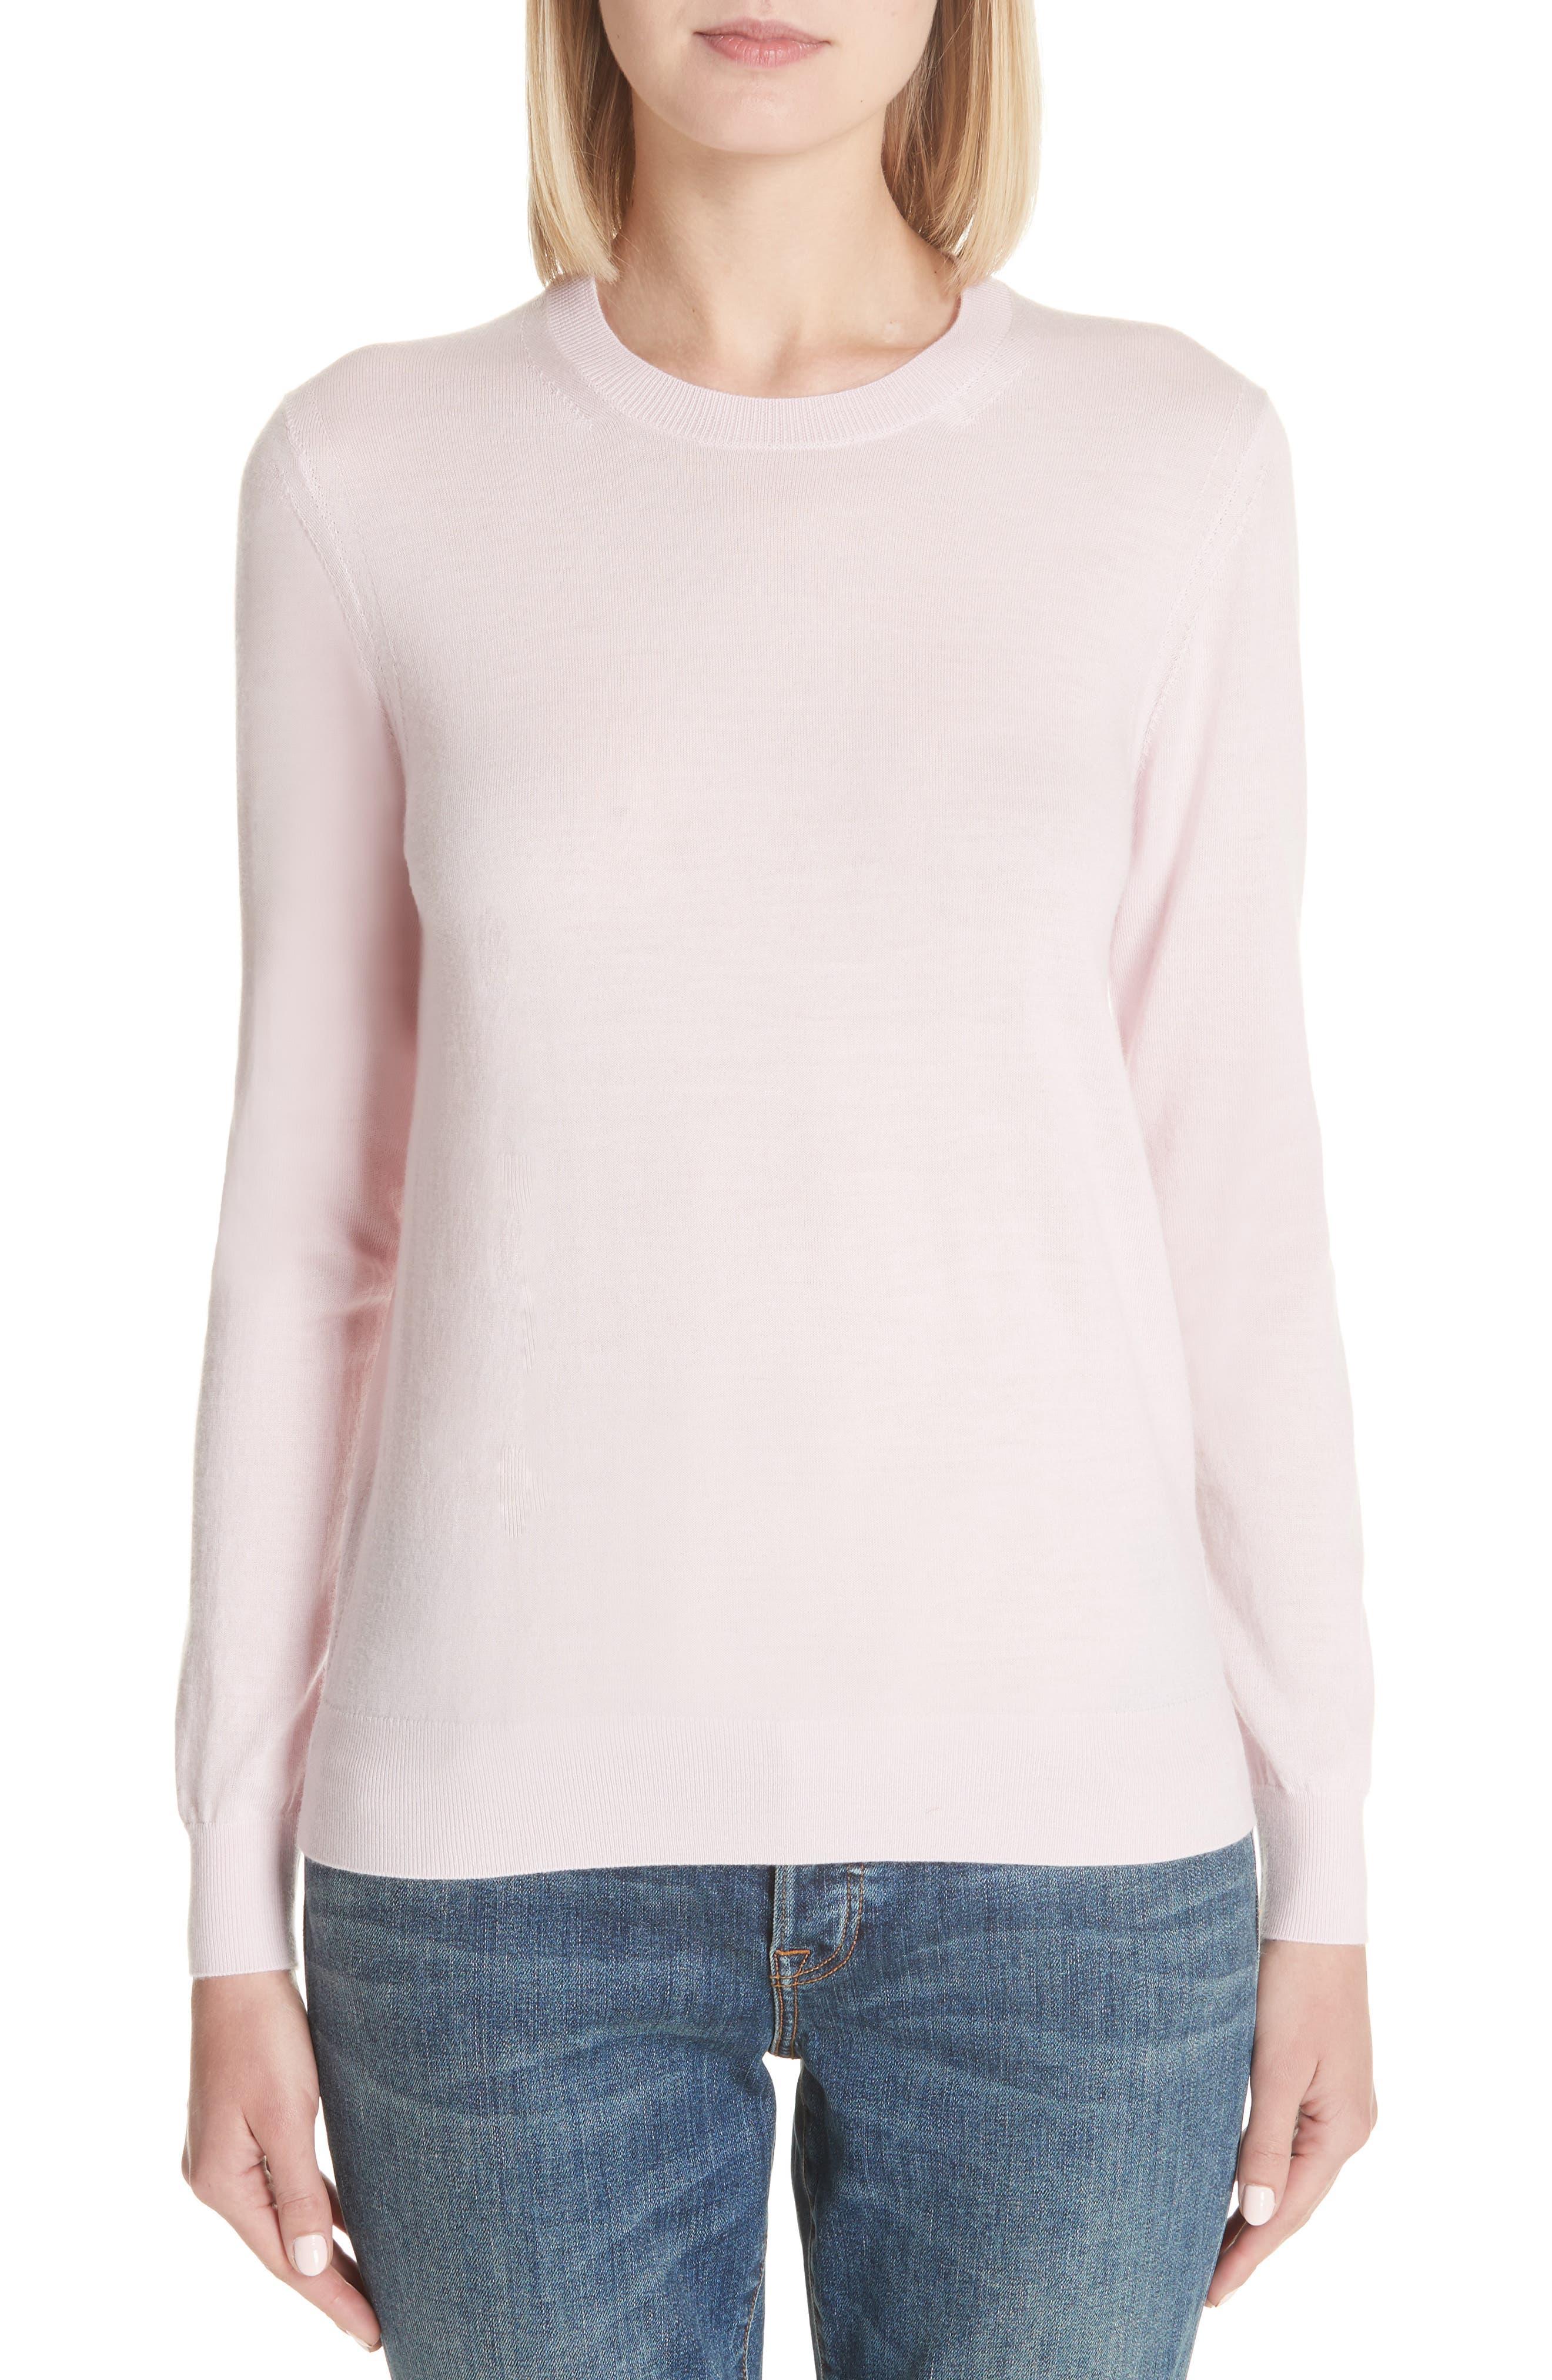 Viar Merino Wool Sweater,                         Main,                         color, Light Pink